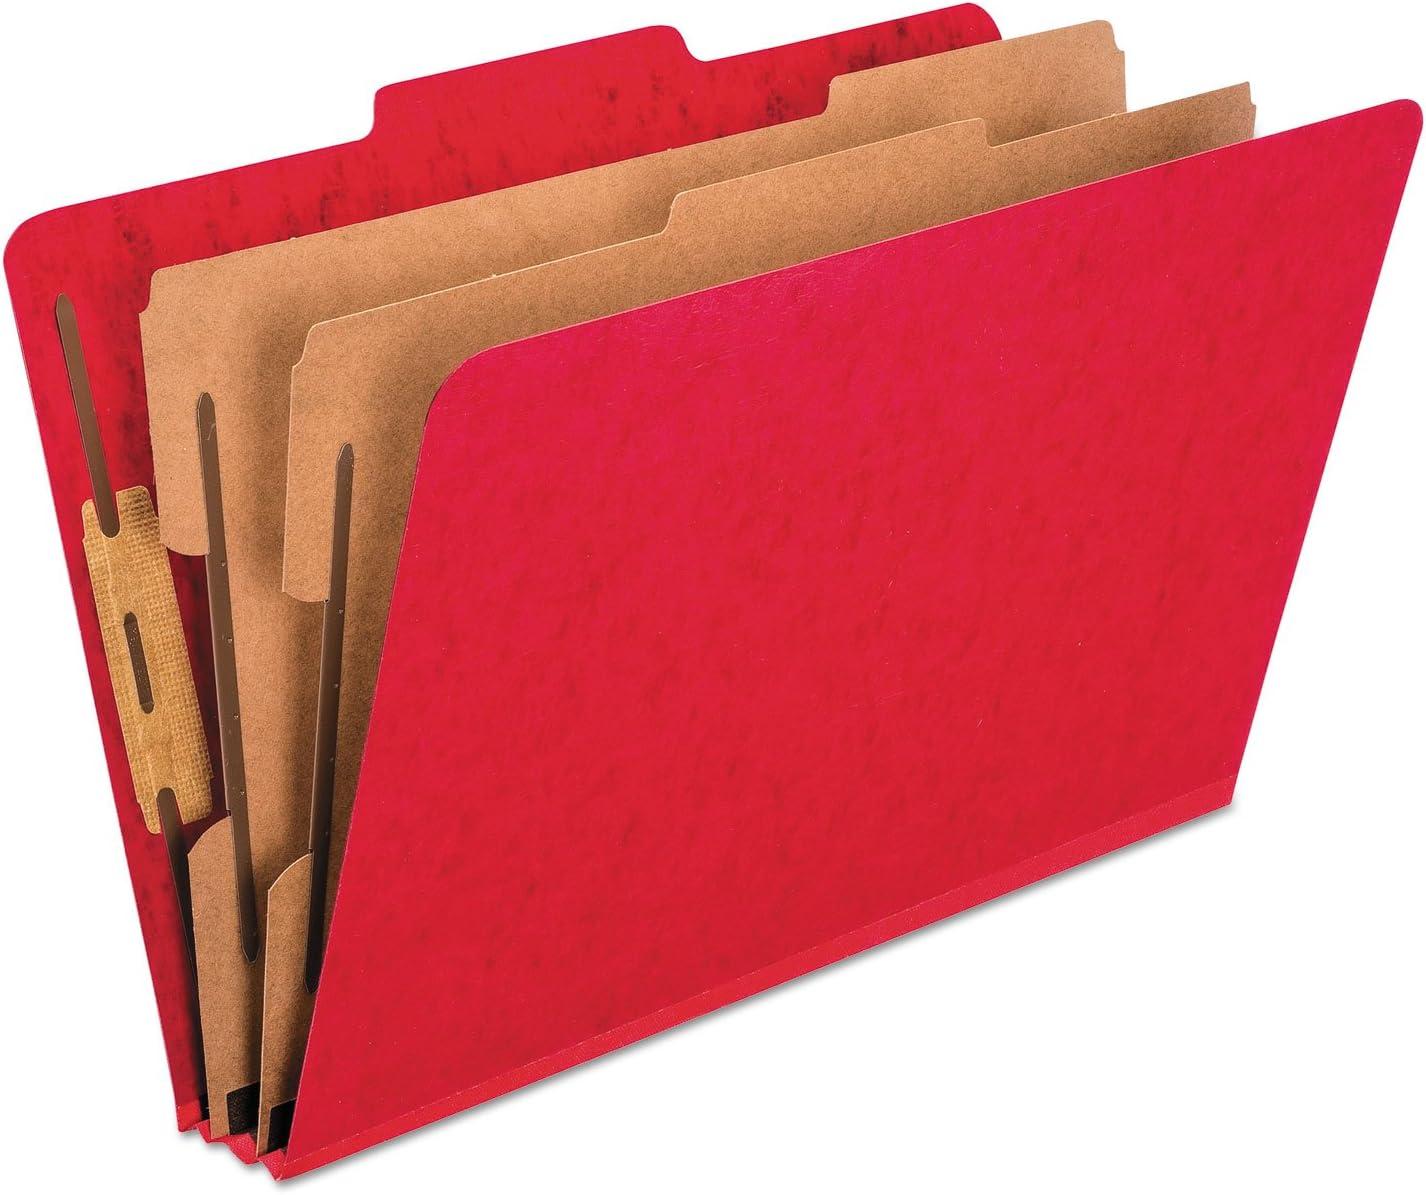 Pendaflex 2257SC Six-Section Colored Leg Classification Sale item Folders OFFicial store